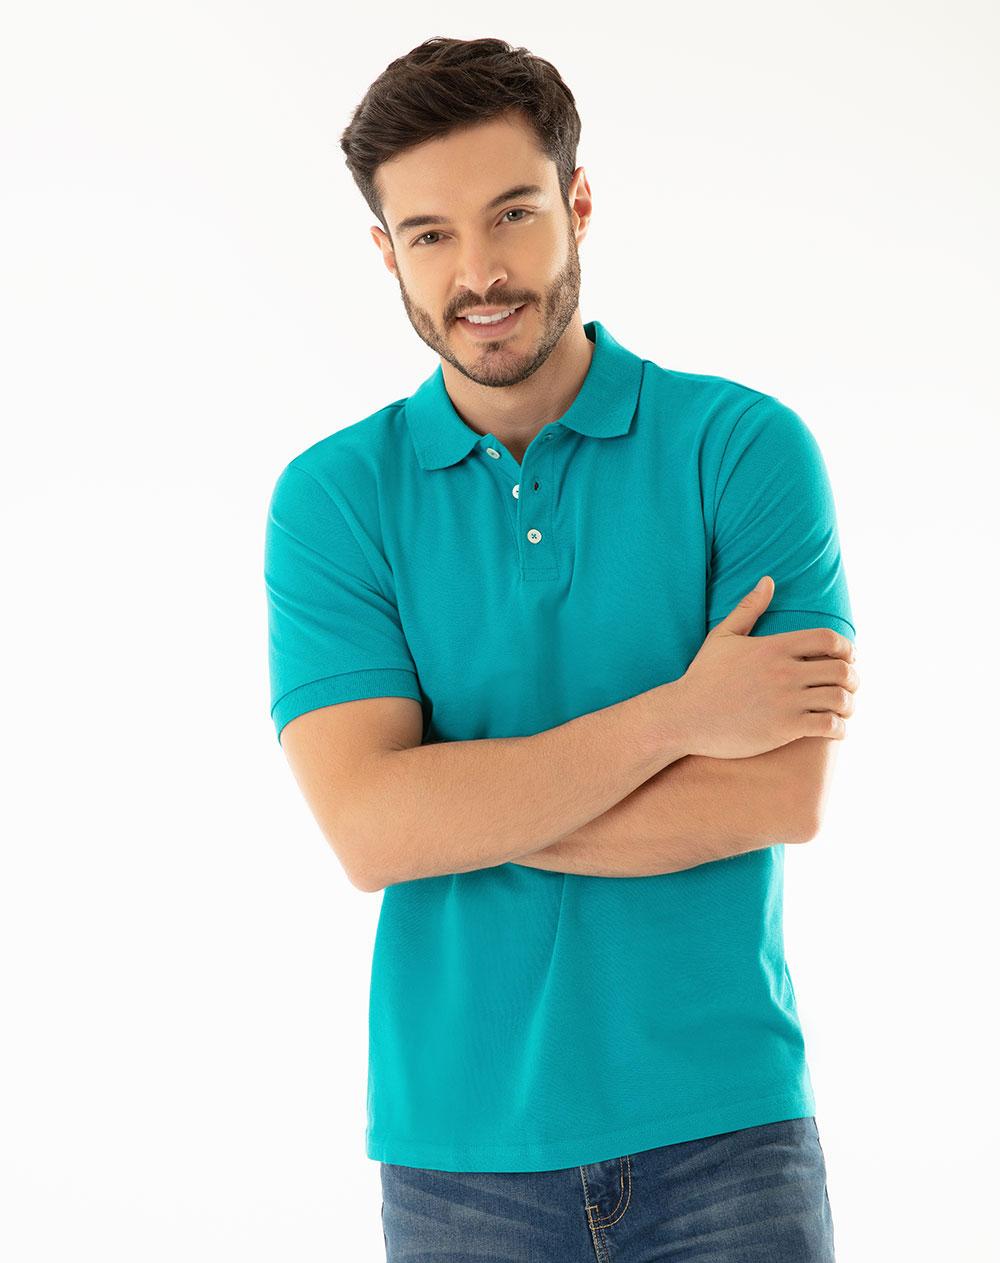 Para Camisetas Gef Camisetas Para Hombre 4Ac5RLq3j